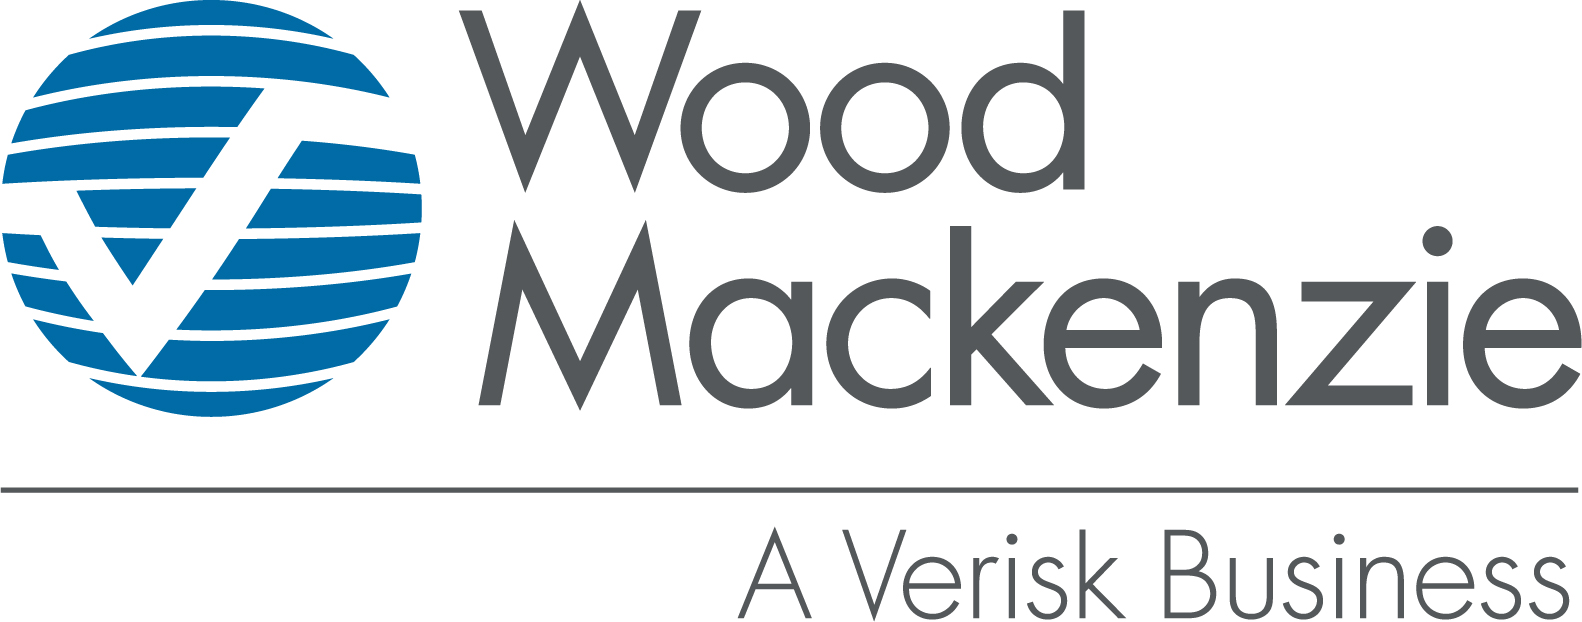 woodmac logo